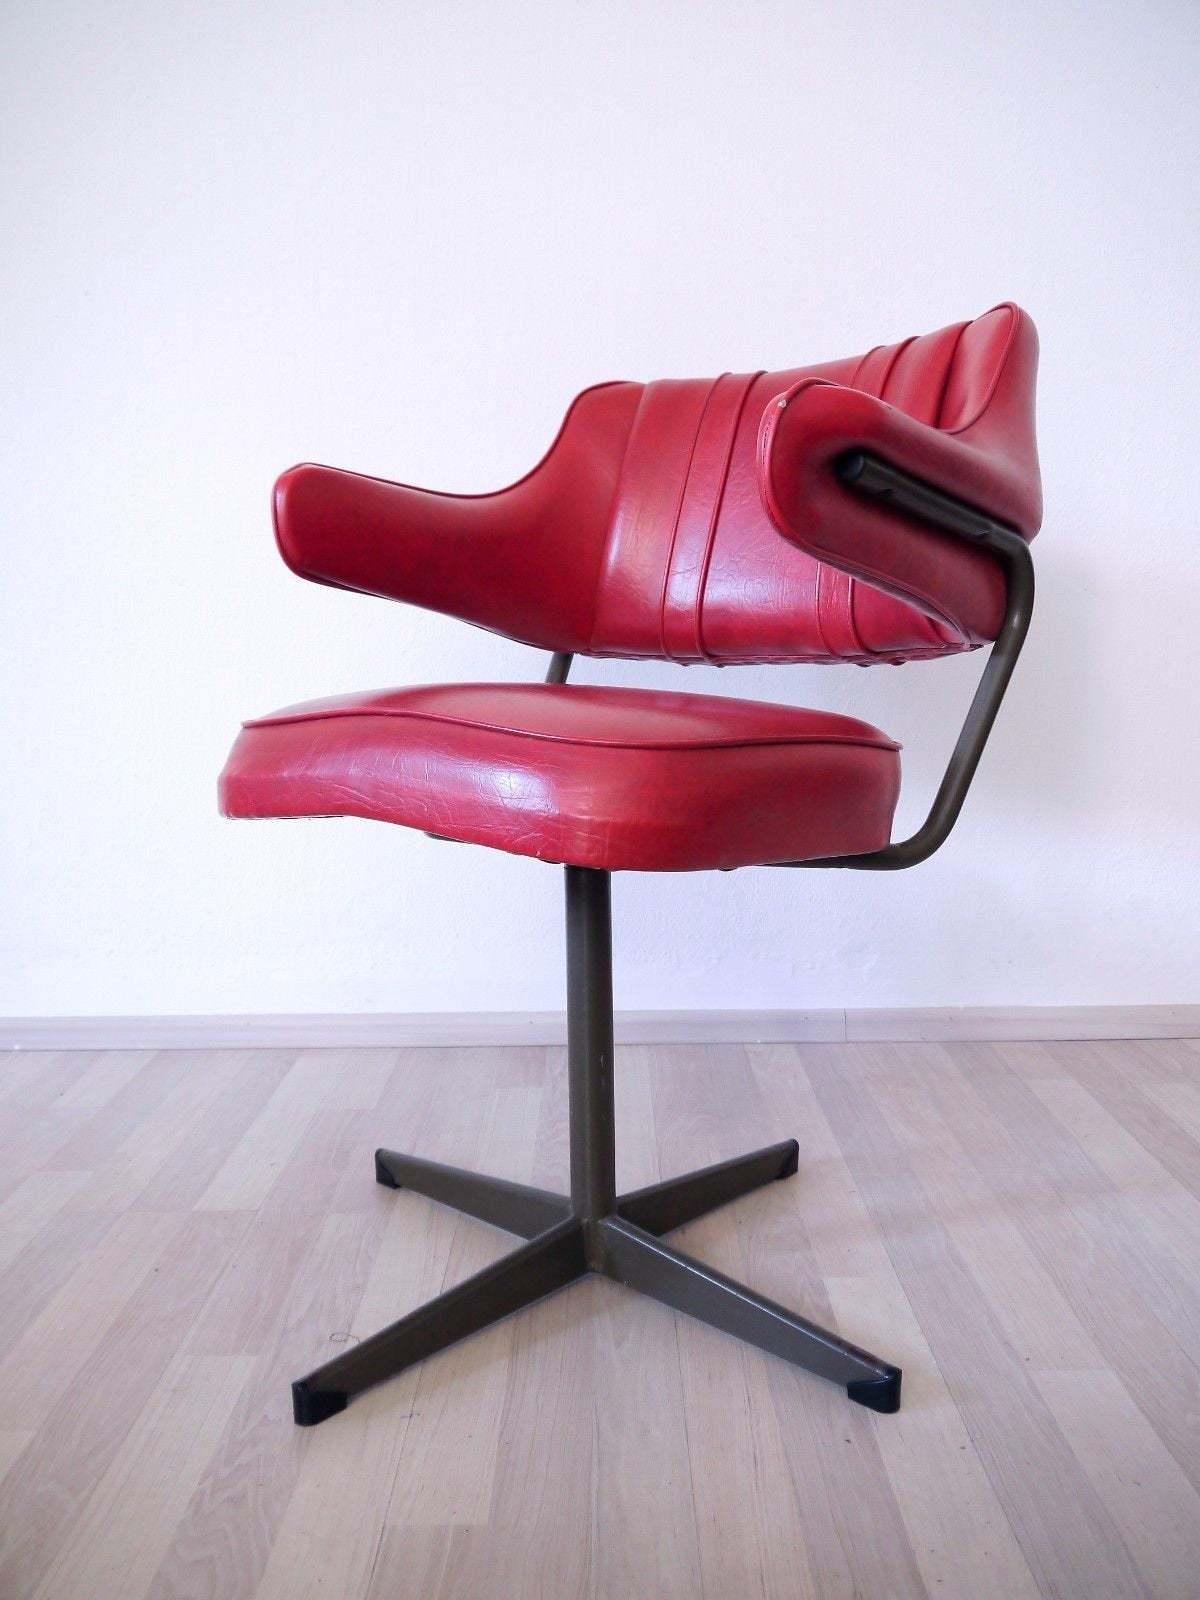 Leather Danish Mid Century Swivel Chair Cherry Red Vintage 1950 S Art Deco Design Industrial Metal